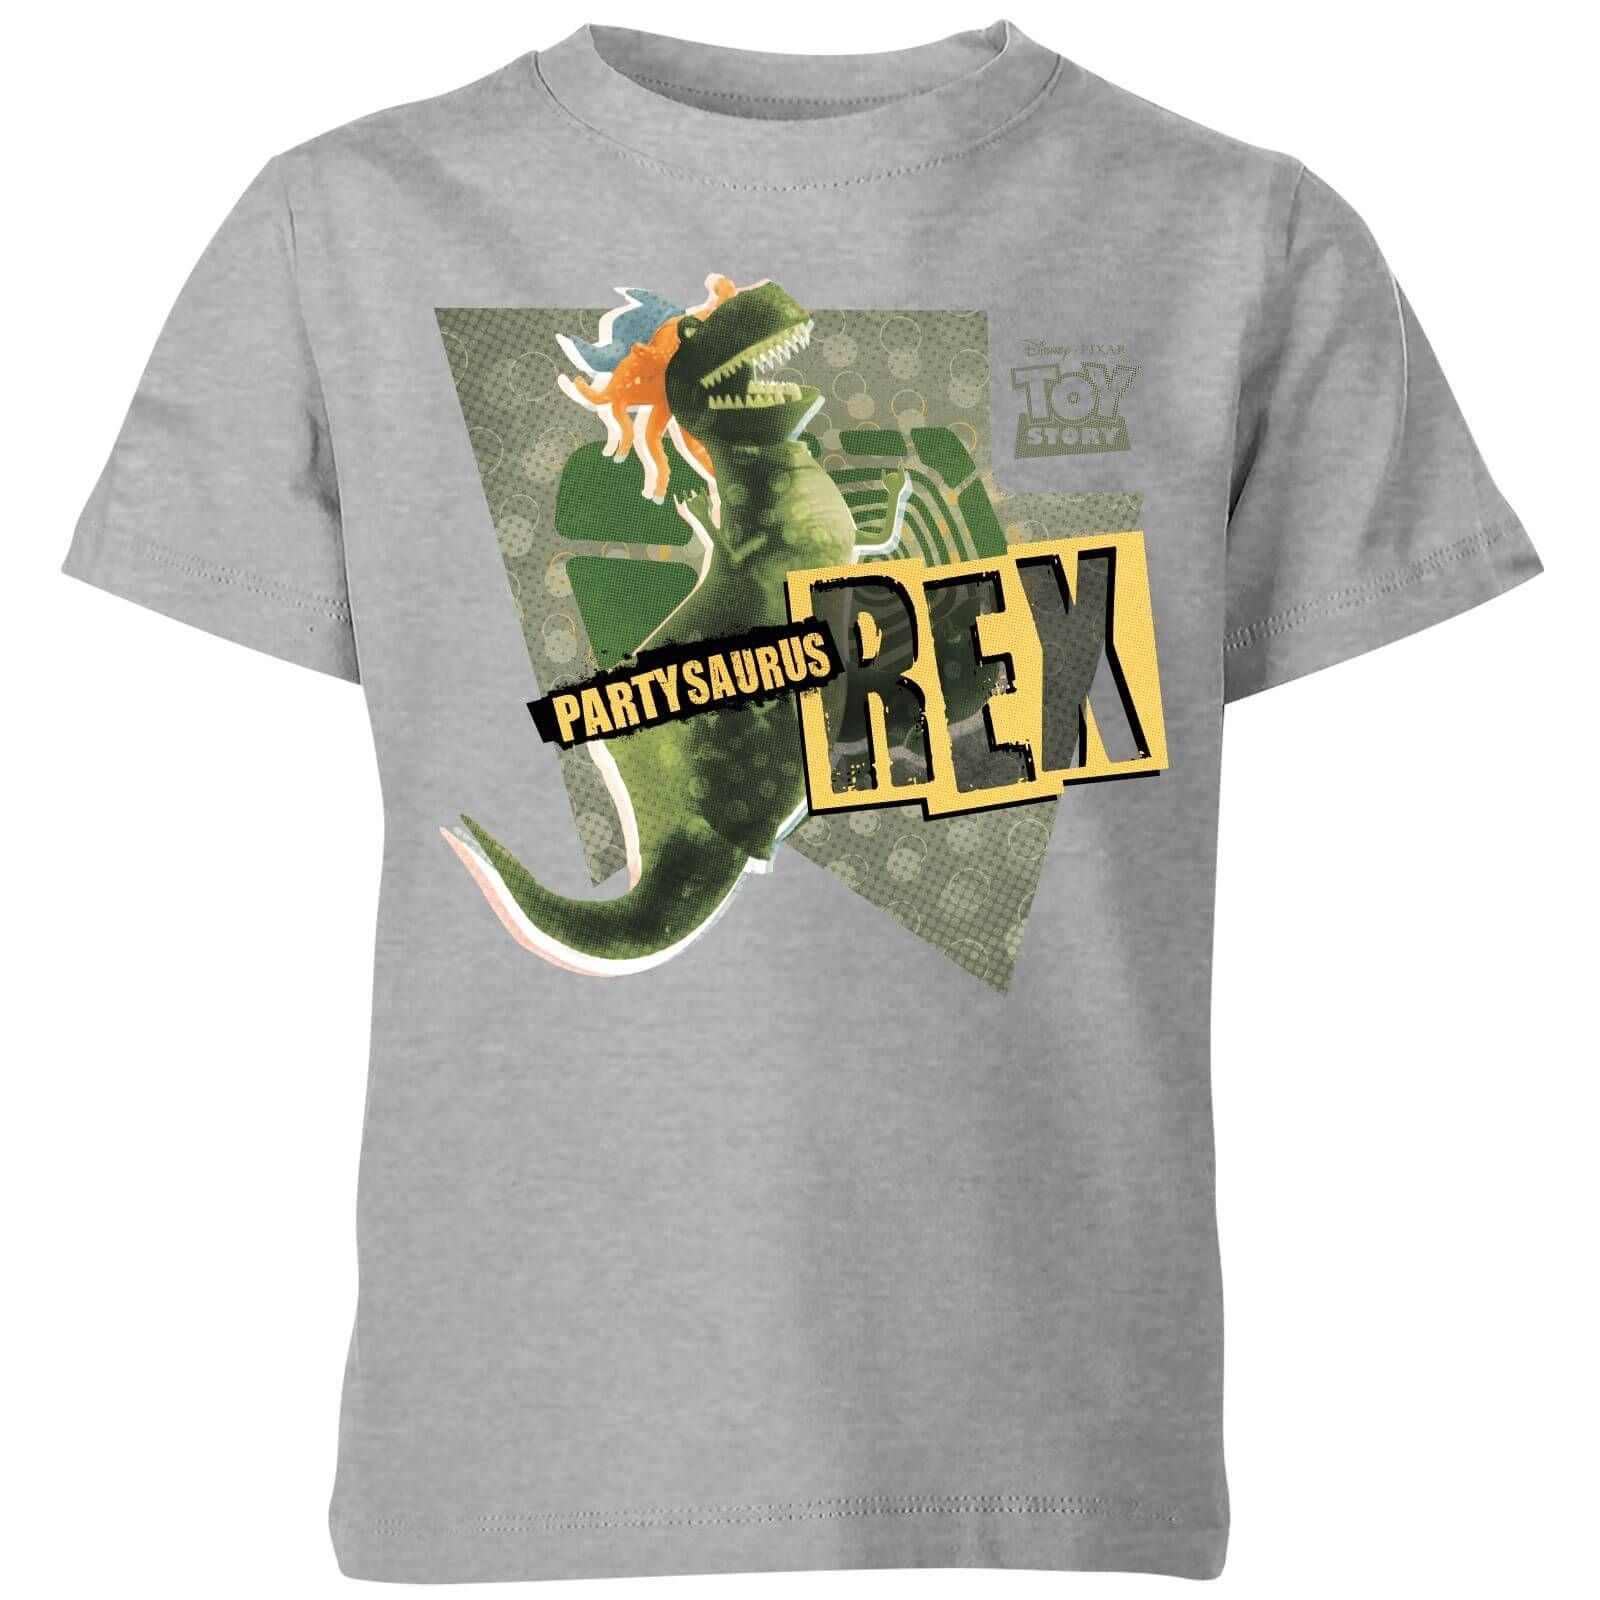 Toy Story Partysaurus Rex Kids' T-Shirt - Grey - 7-8 Years - Grey